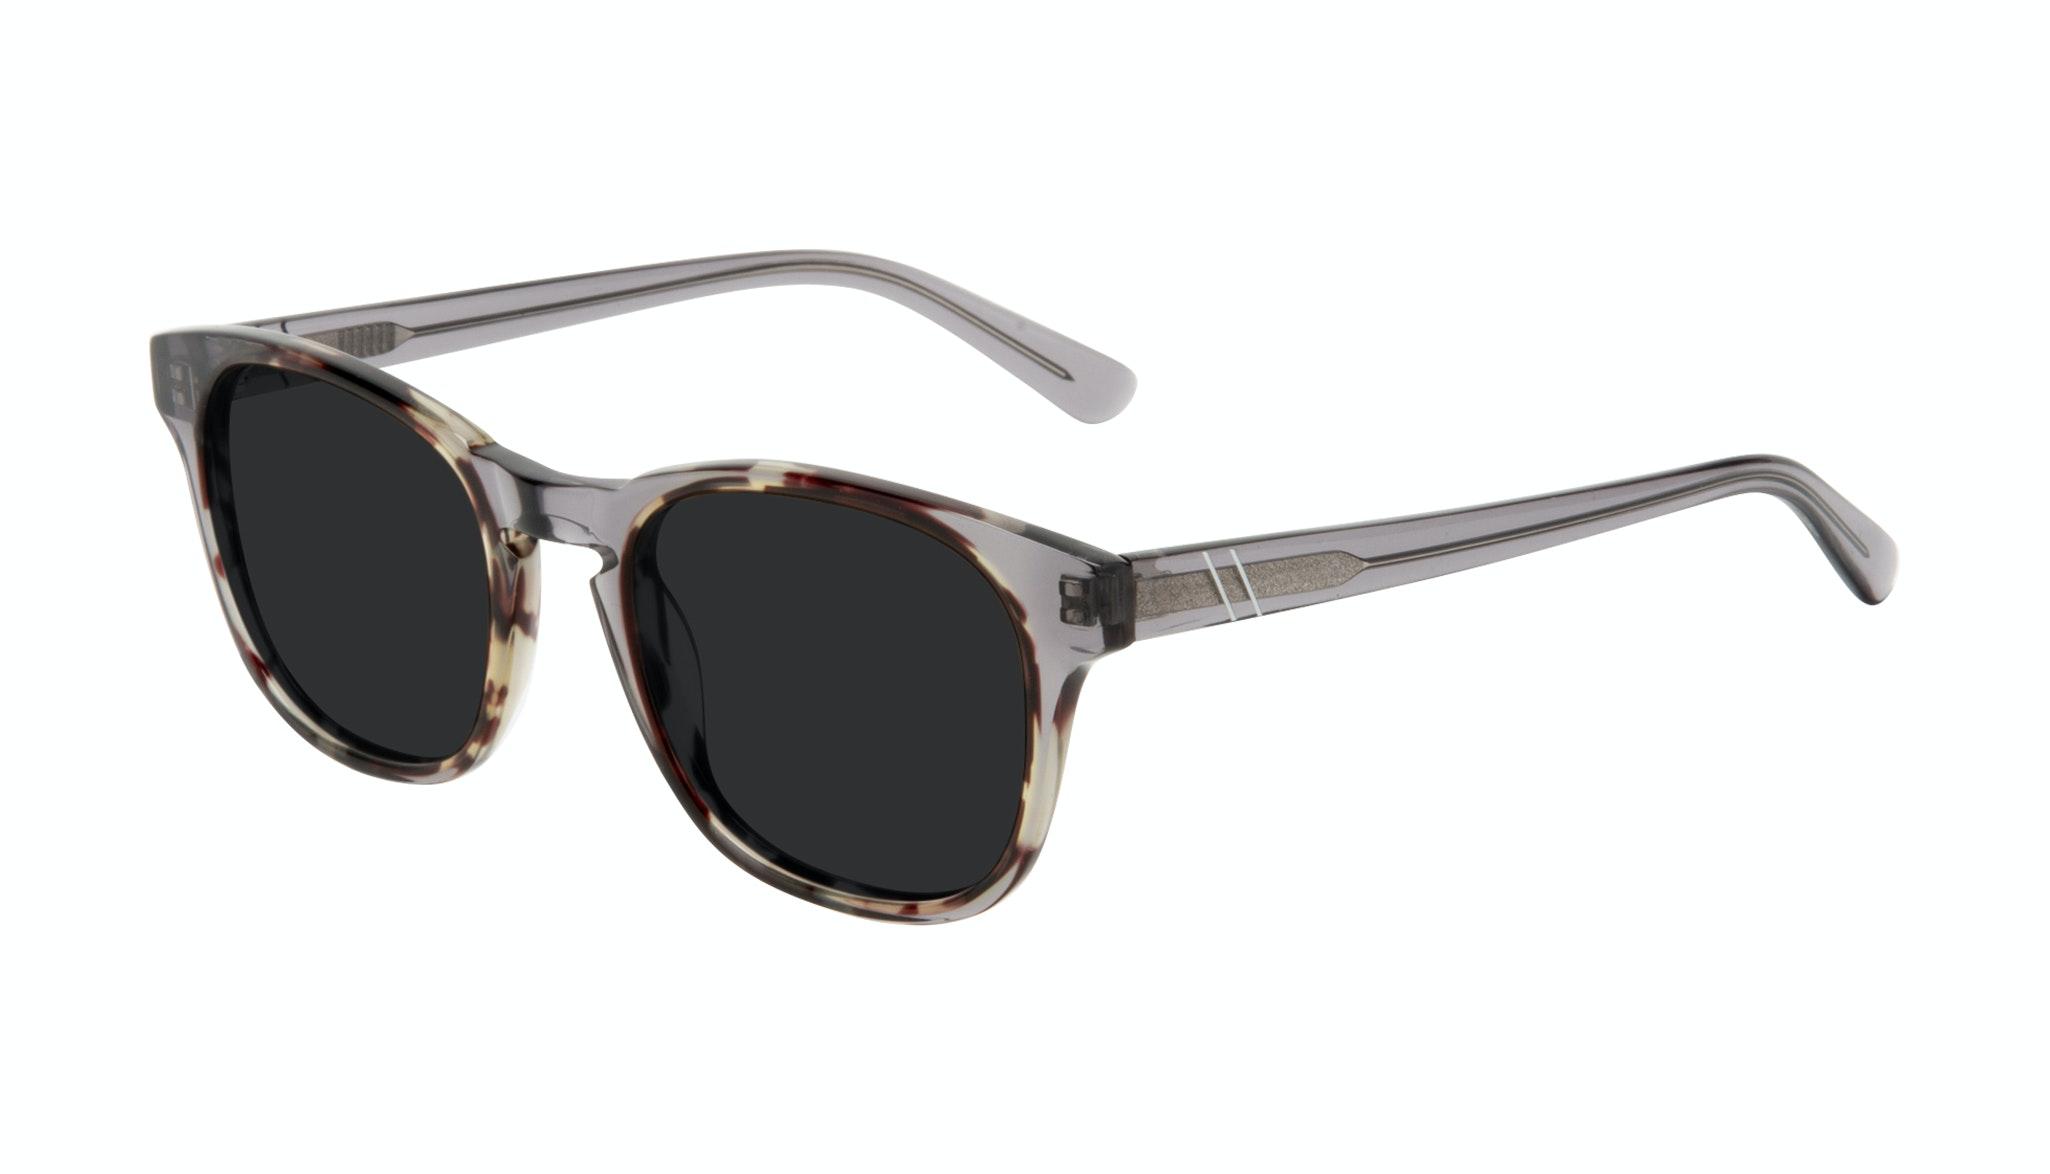 Affordable Fashion Glasses Square Sunglasses Men Outline Smokey Tort Tilt